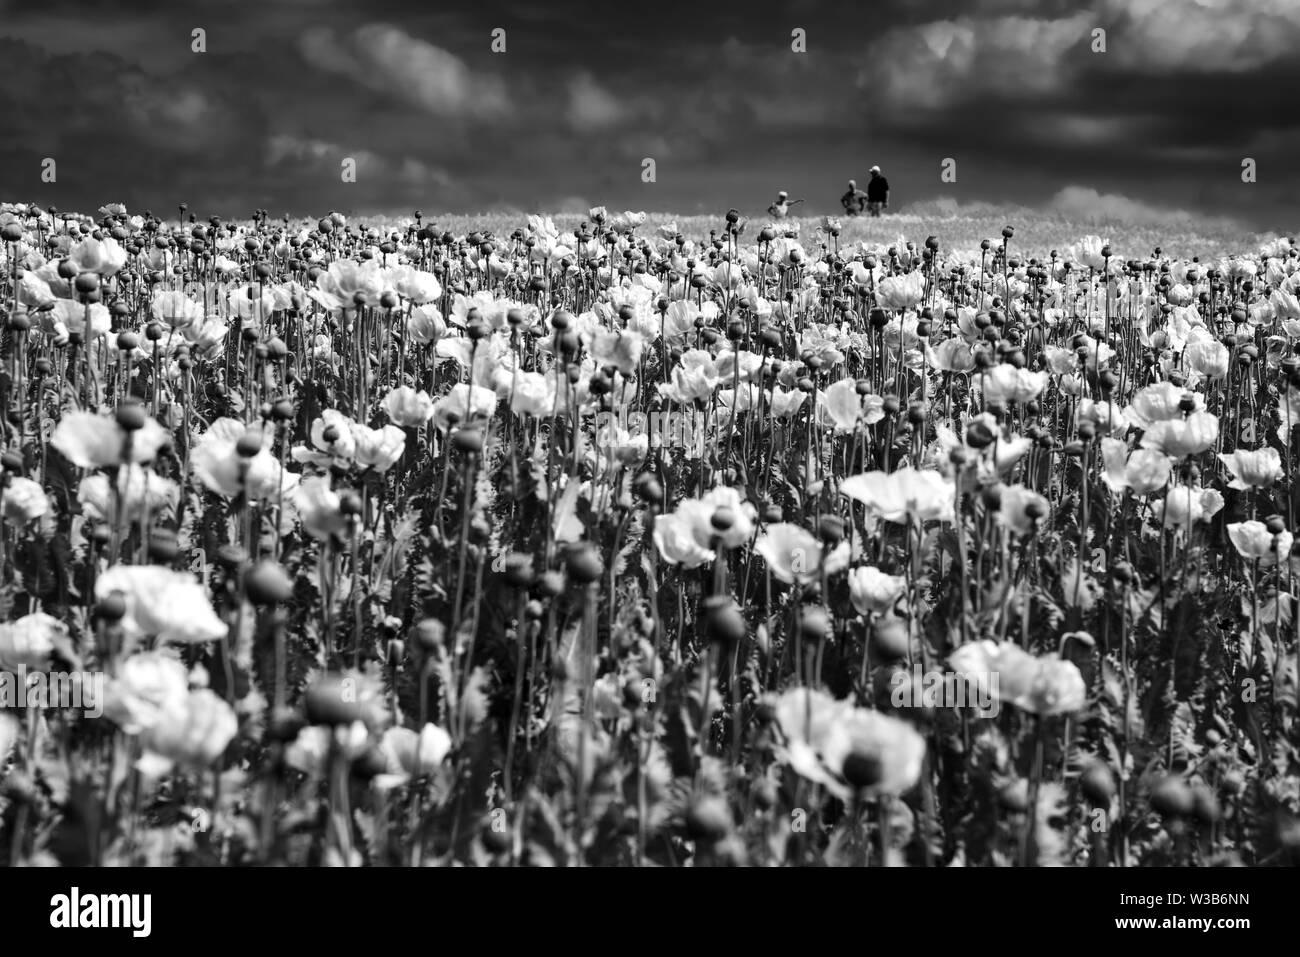 Opium poppy field, Germerode, Werra-Meissner district, Hesse, Germany Stock Photo